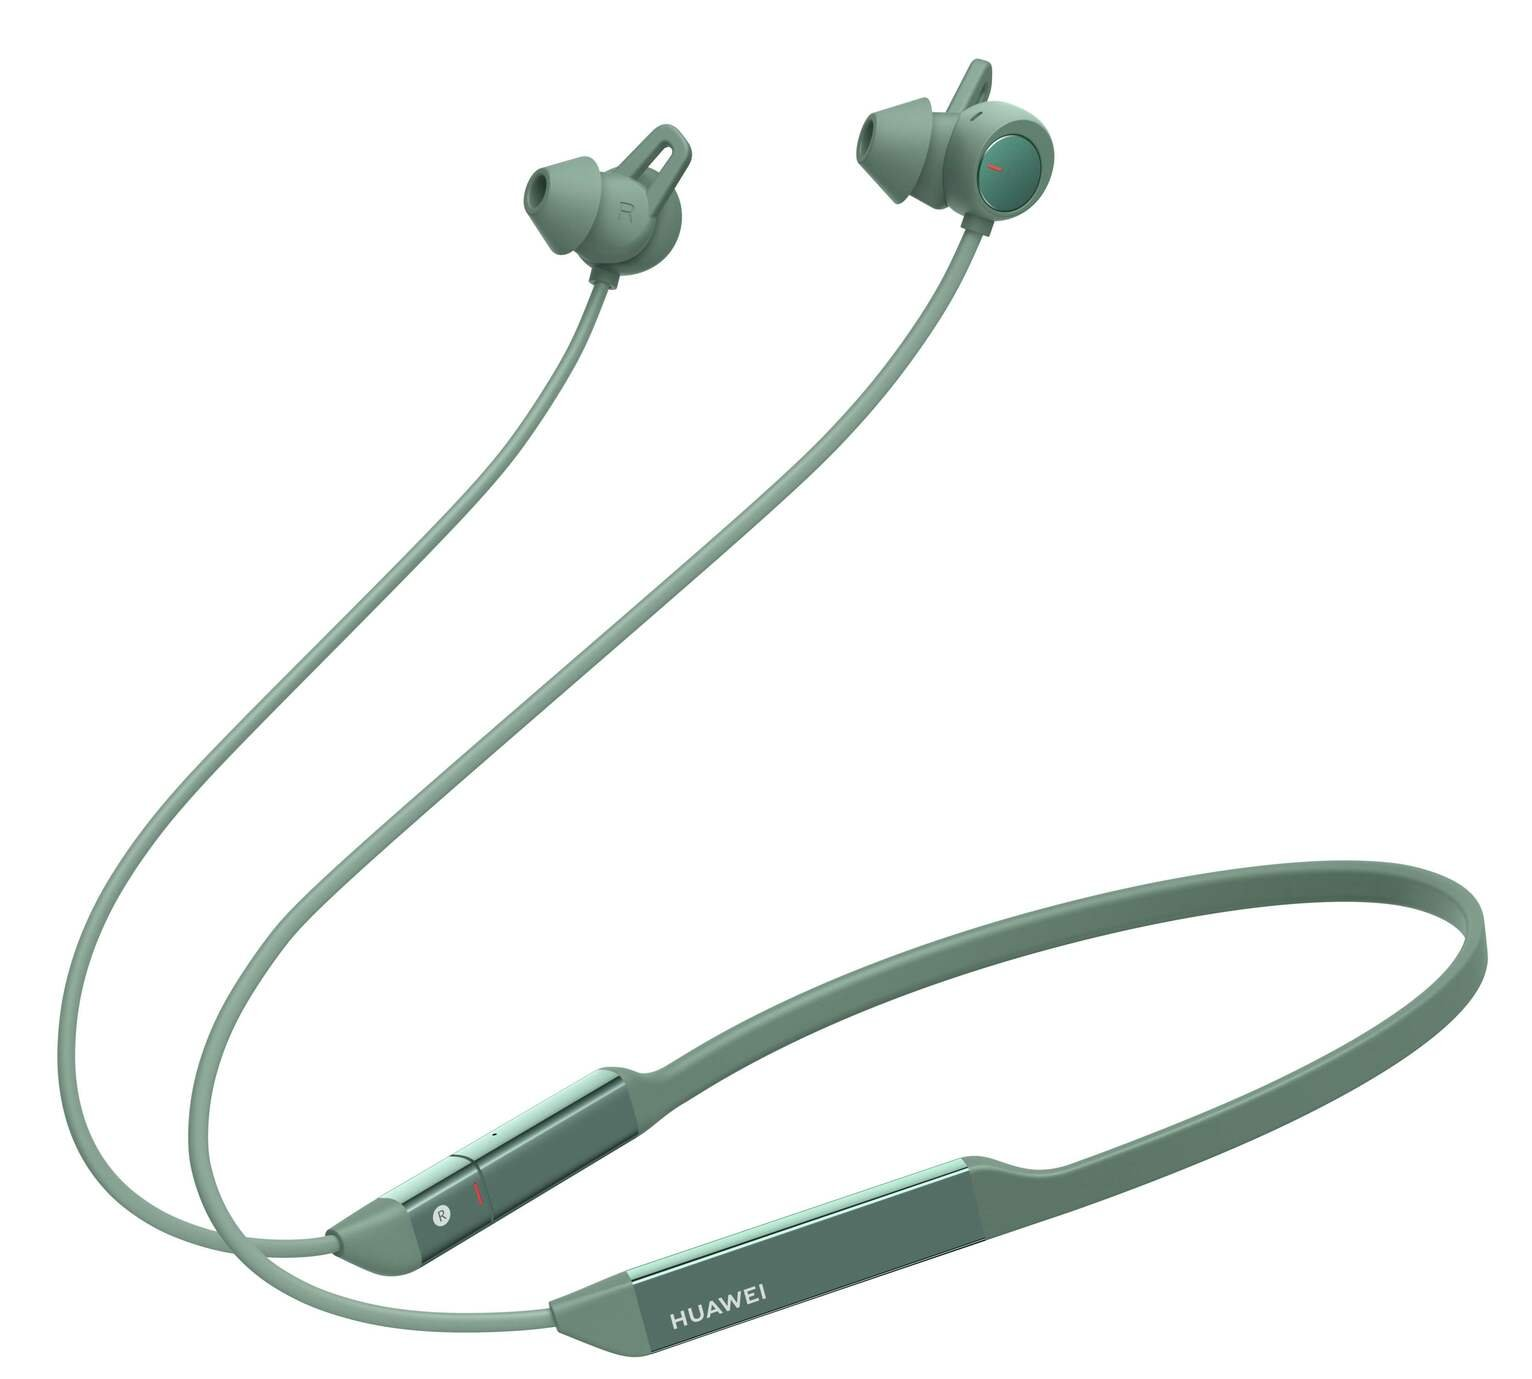 Huawei Freelace Pro Noise Cancellation Wireless Headphones